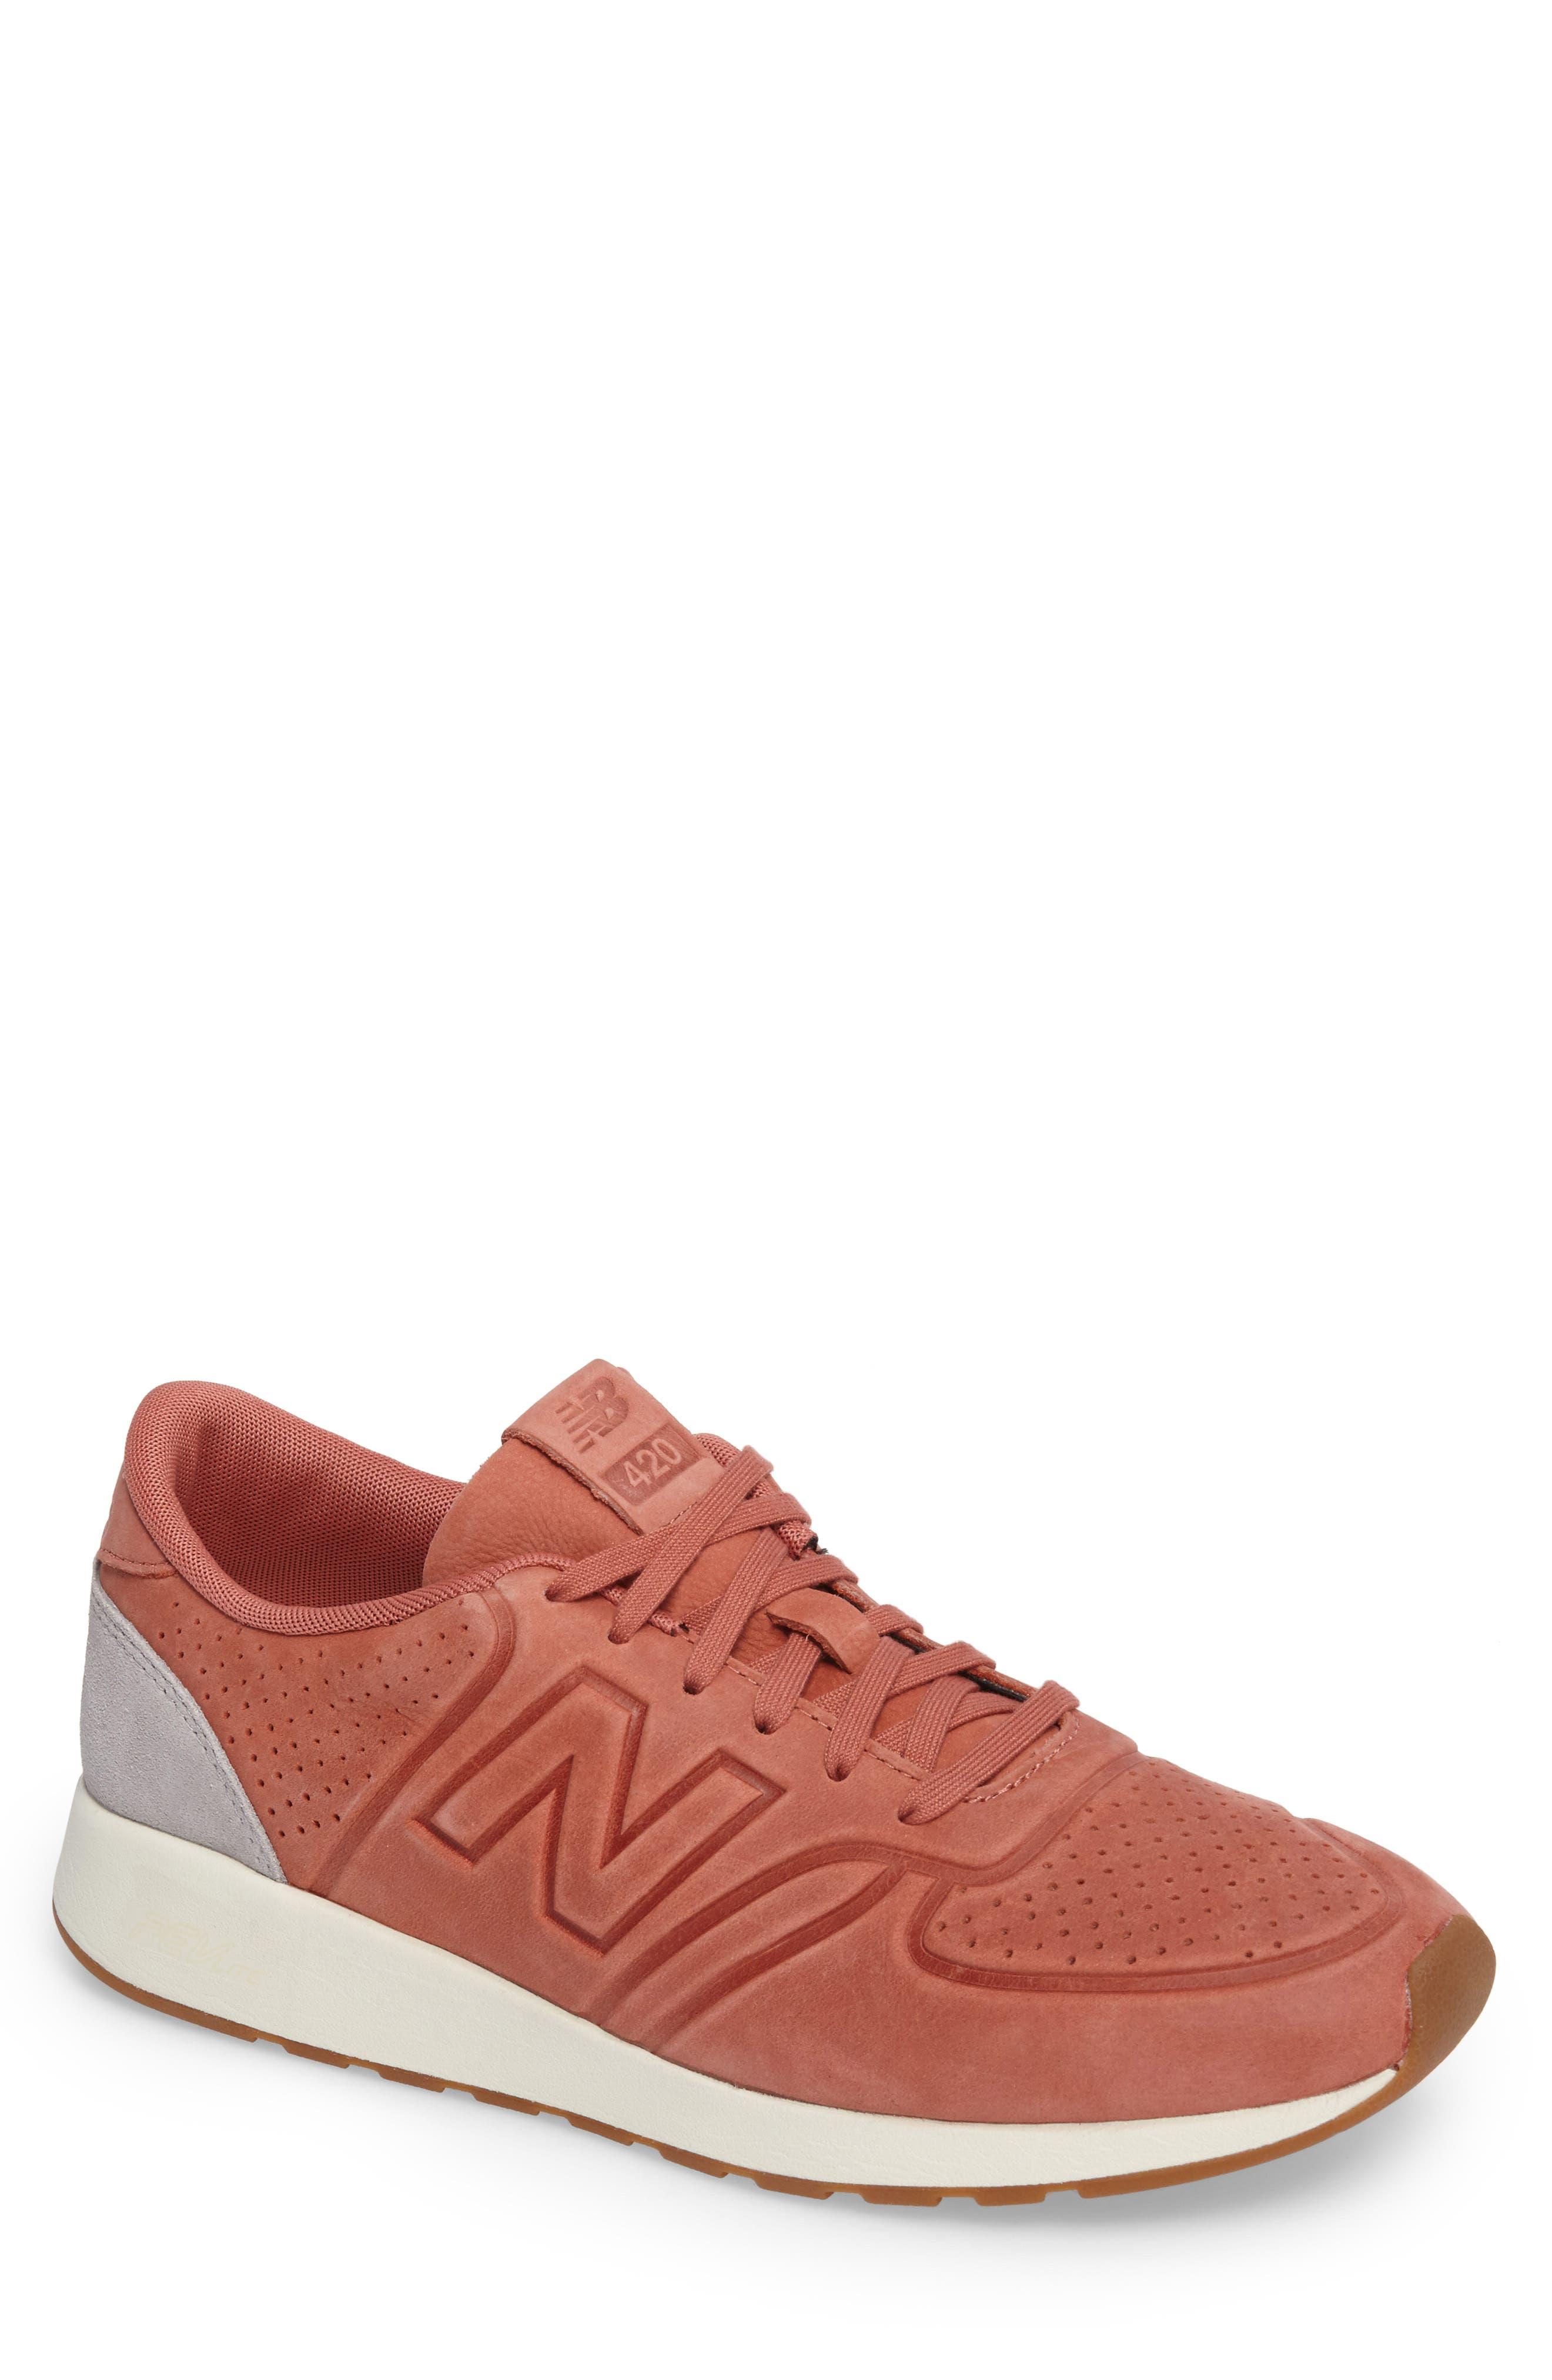 Alternate Image 1 Selected - New Balance 420 Premium Decon Sneaker (Men)